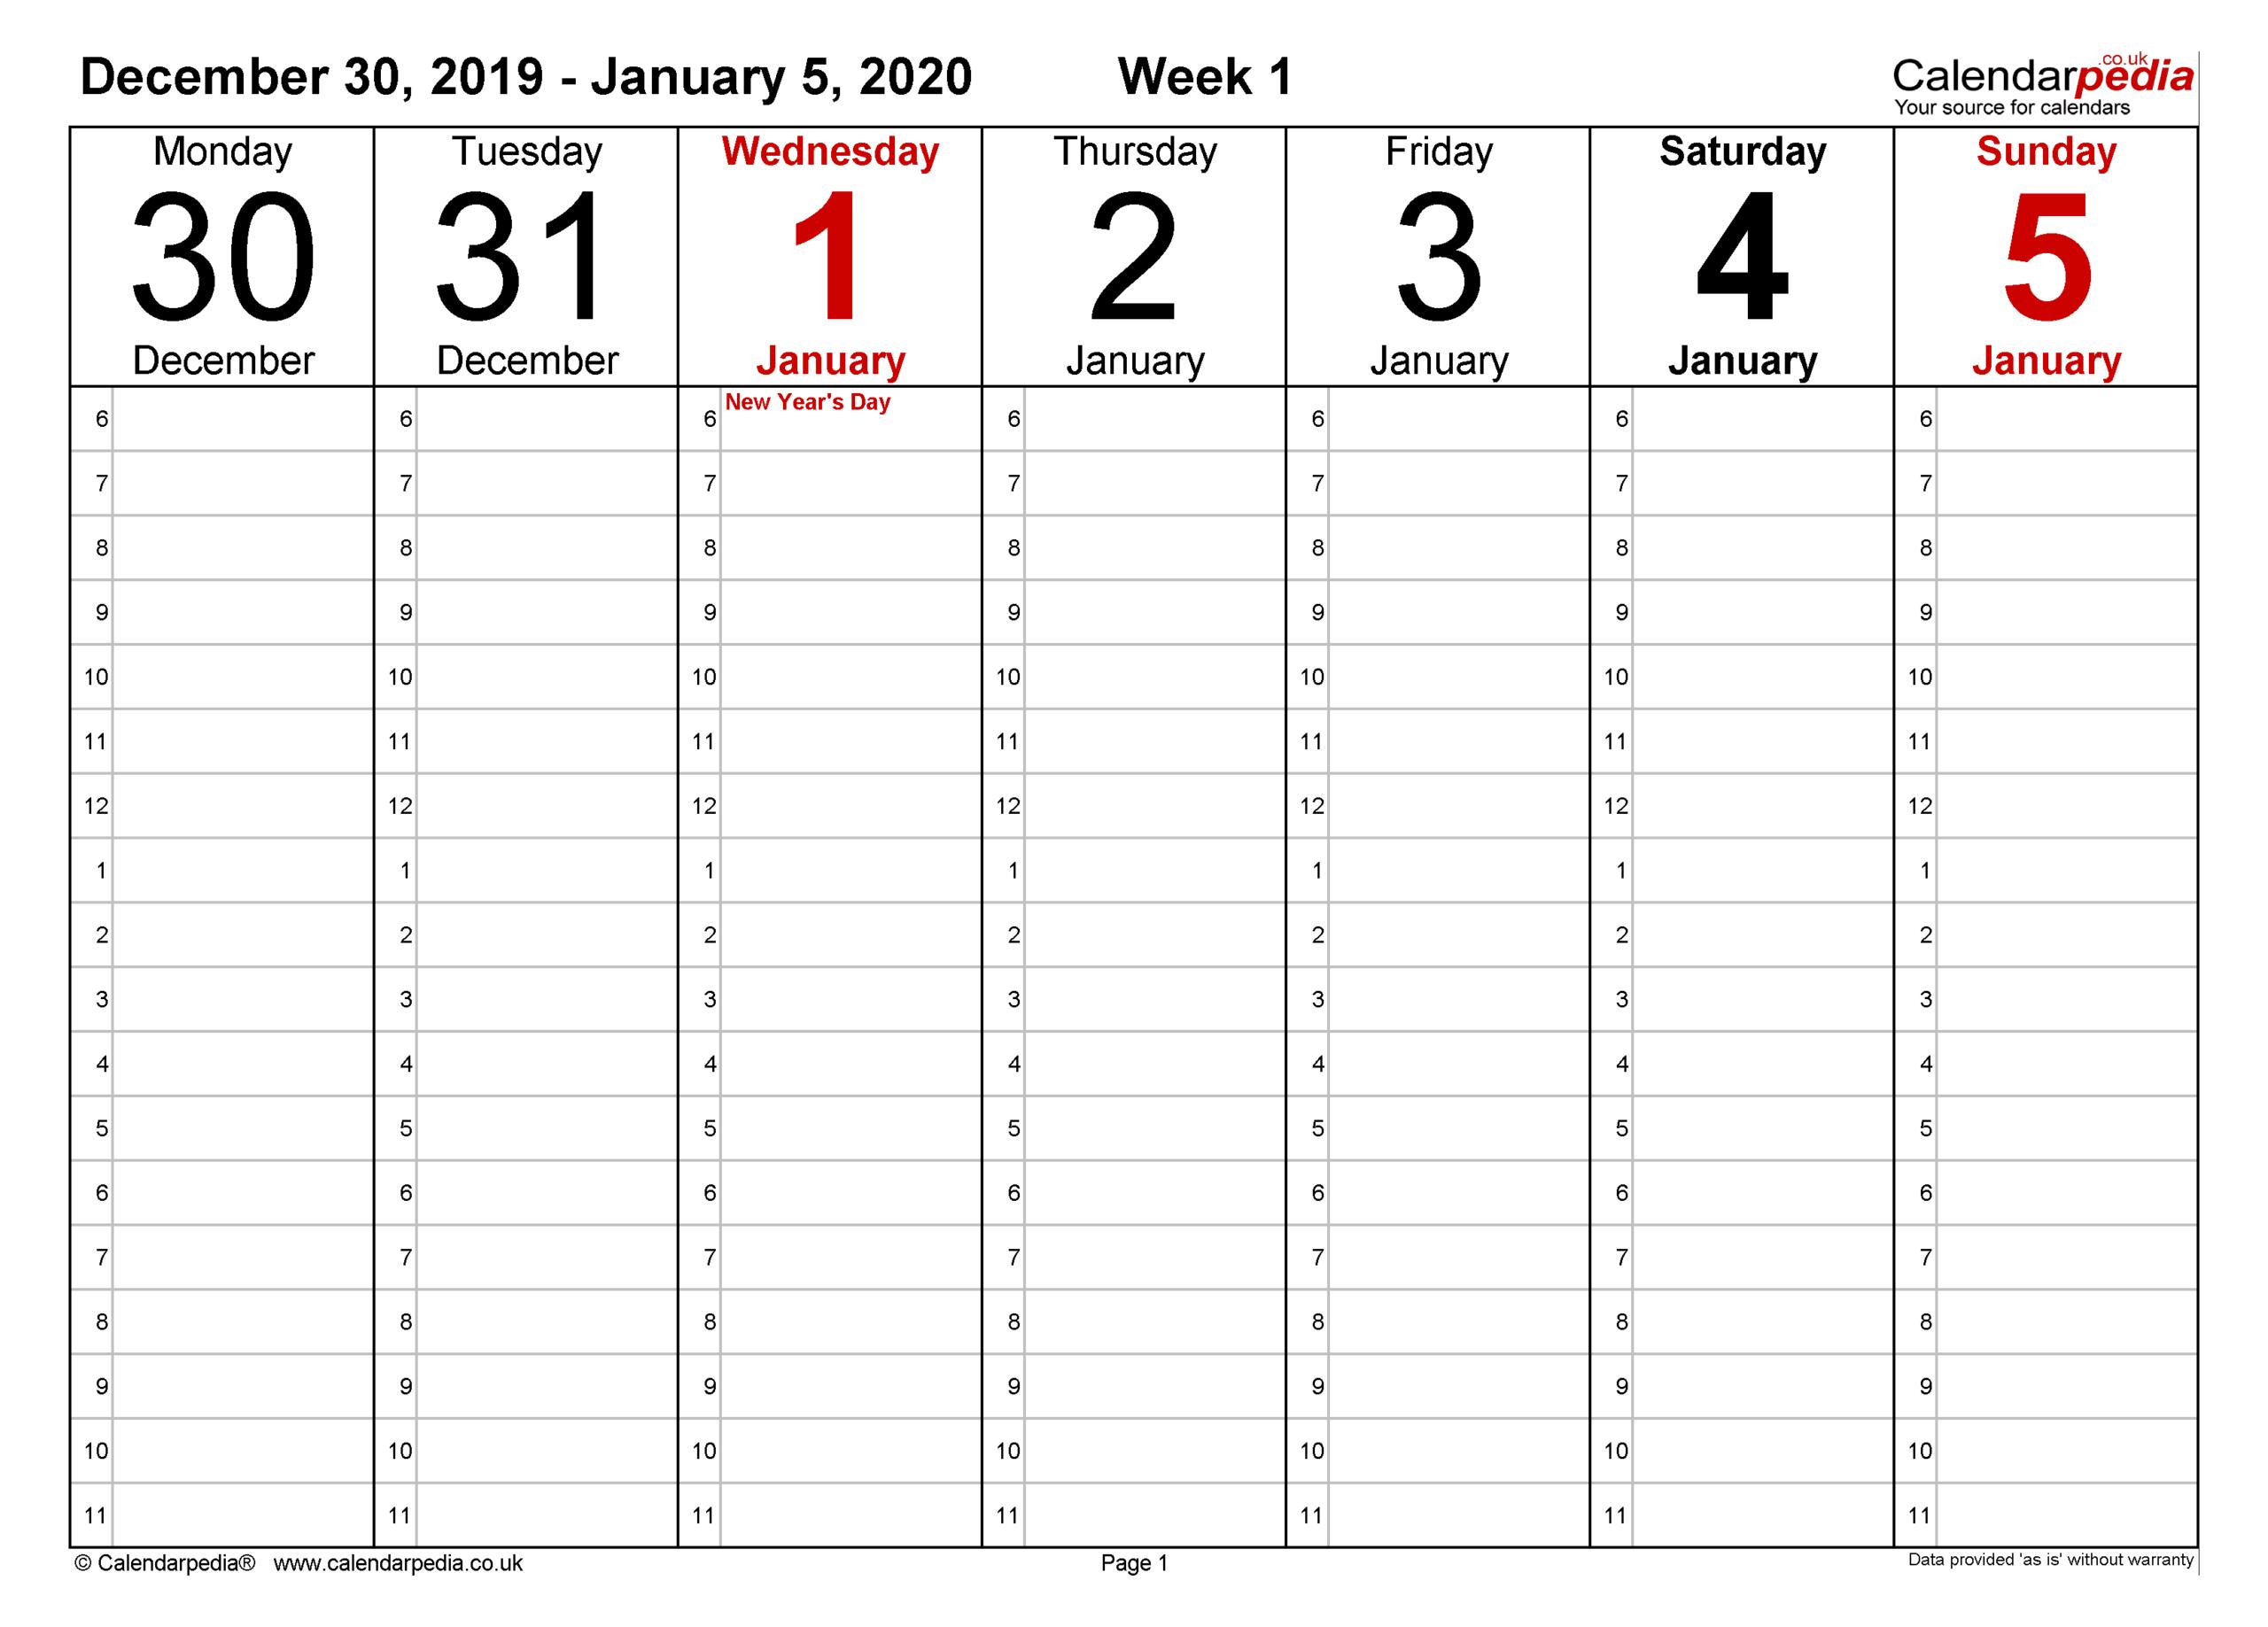 Weekly Calendar 2020 Uk - Free Printable Templates For Pdf